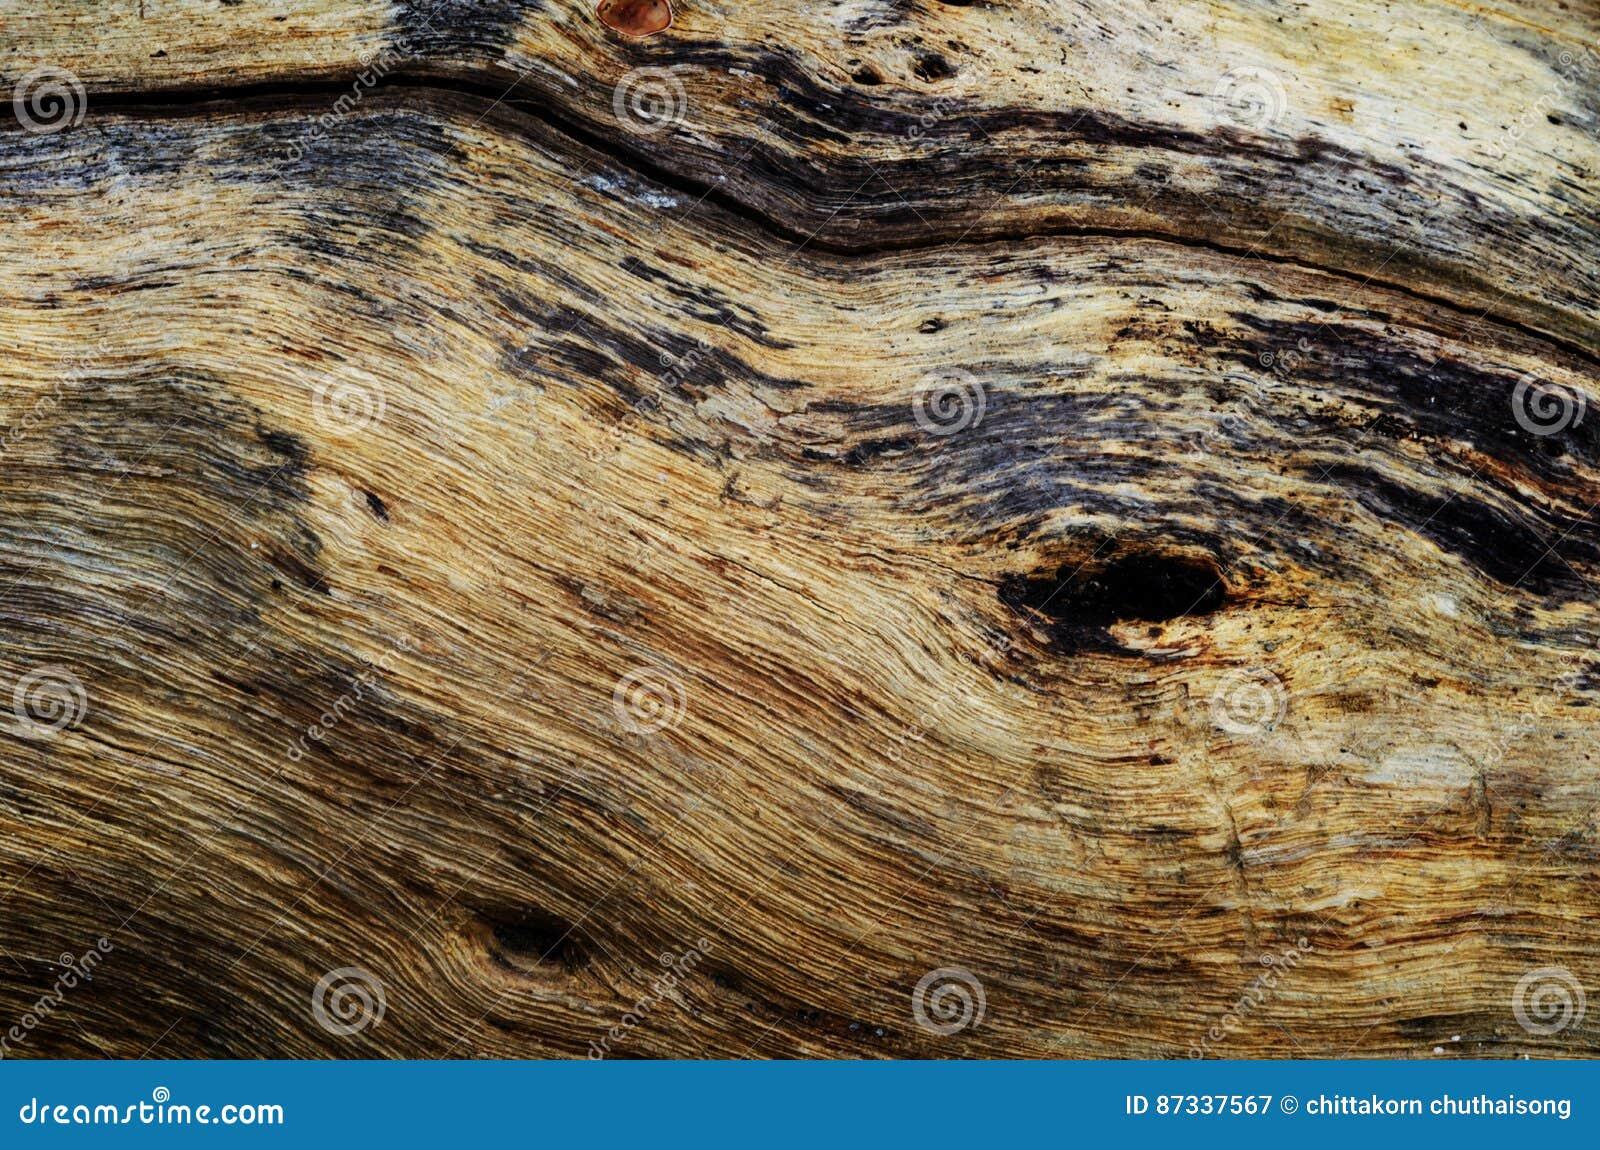 Fondo de madera de la textura textura de madera marrón con golpeteo natural